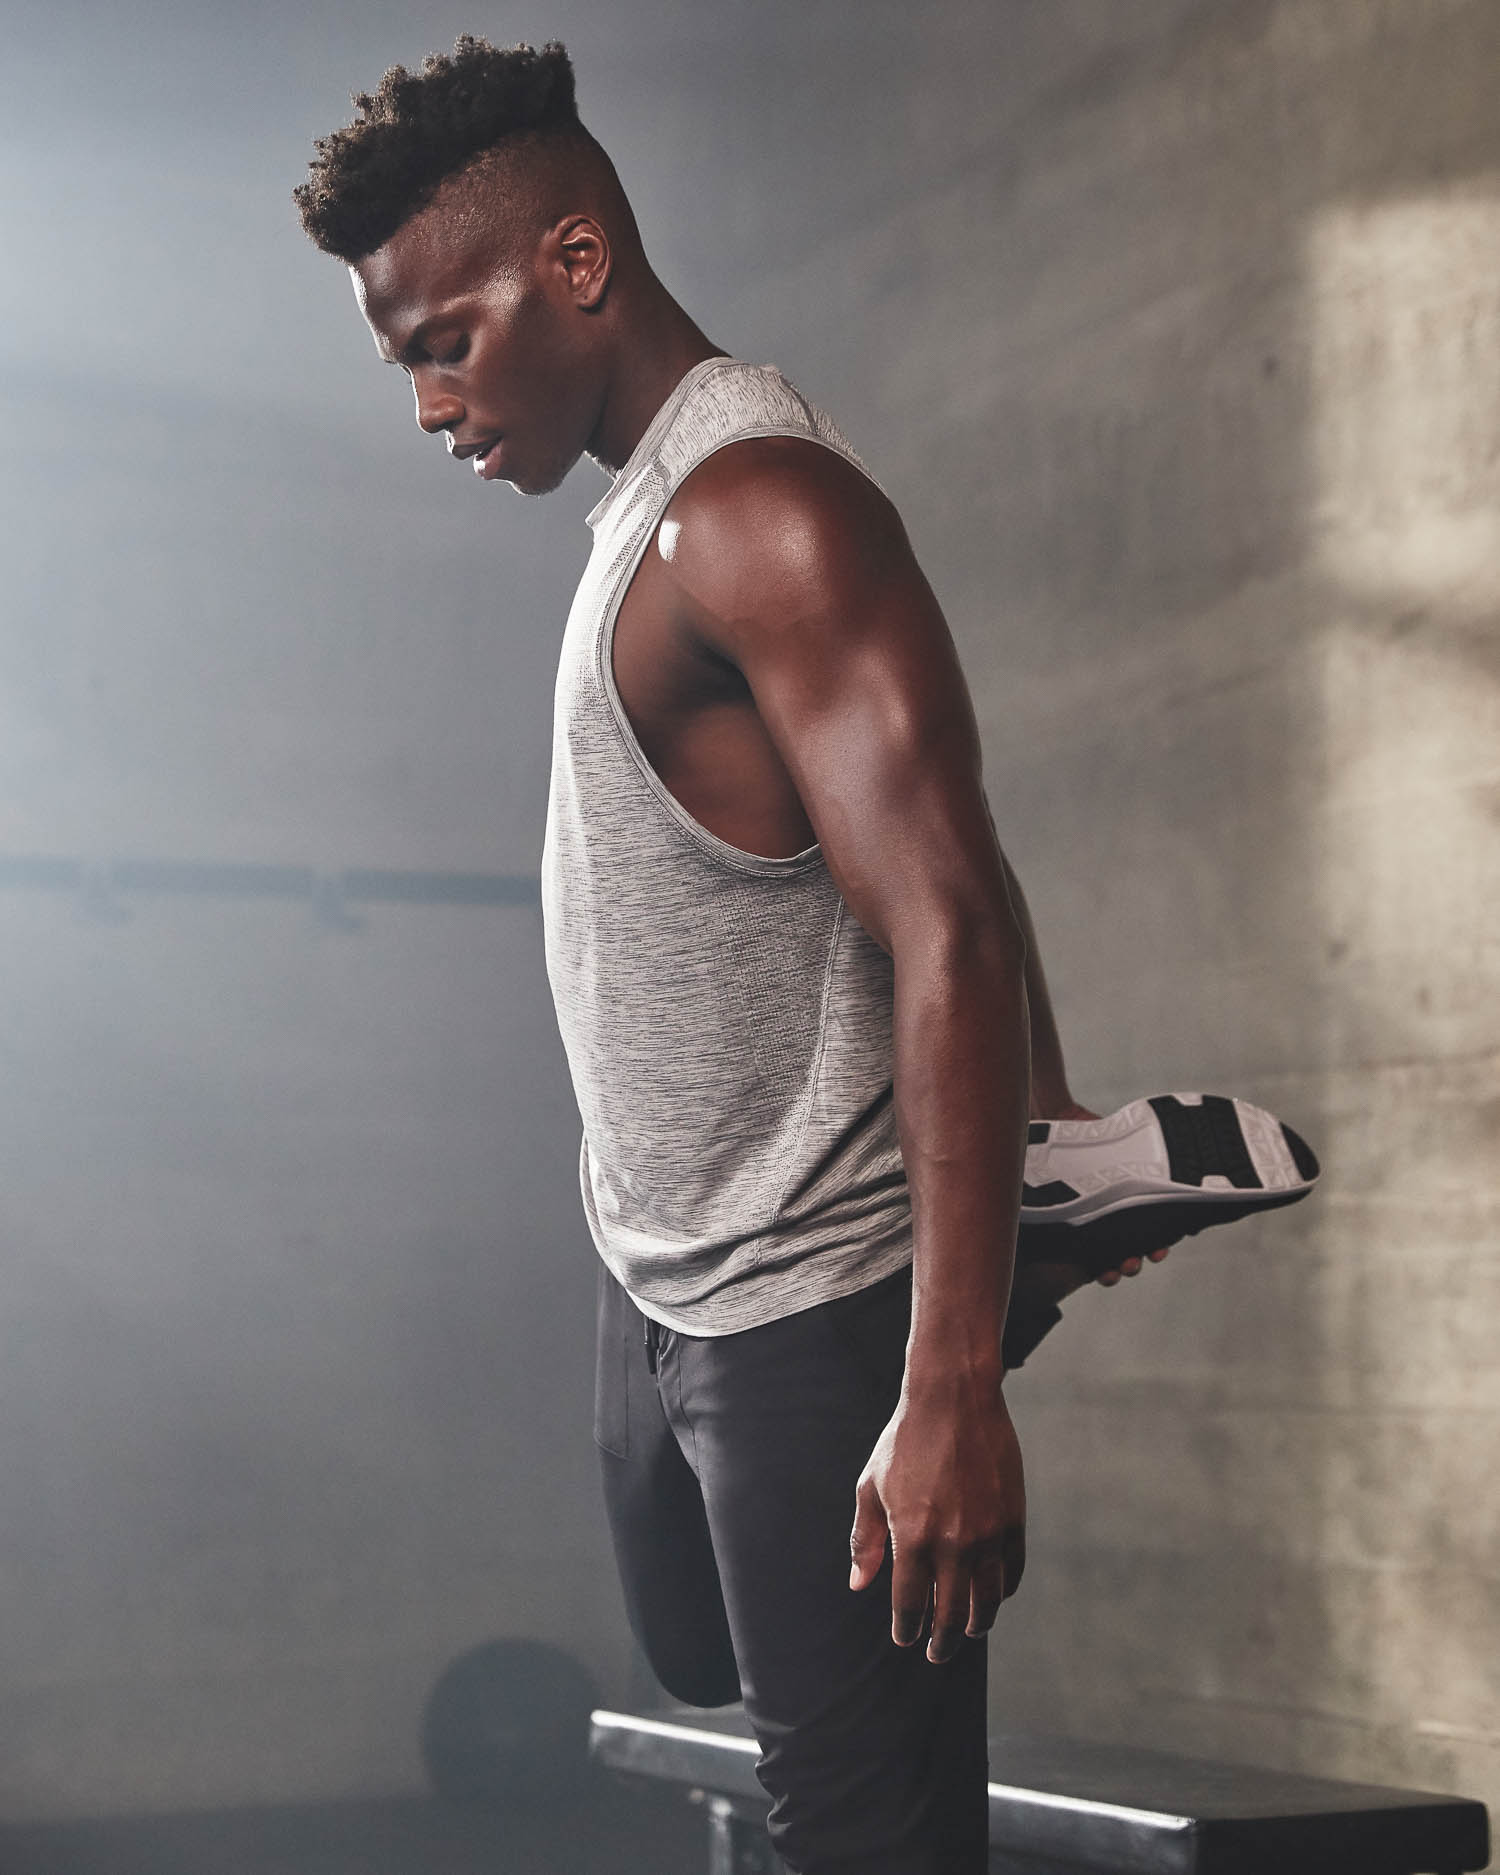 lululemon-mens-workout-training-Jemaal-Alexander-39817-MK-Matt-Korinek-Photography-Copyright-2018-SQSP-1500px.jpg